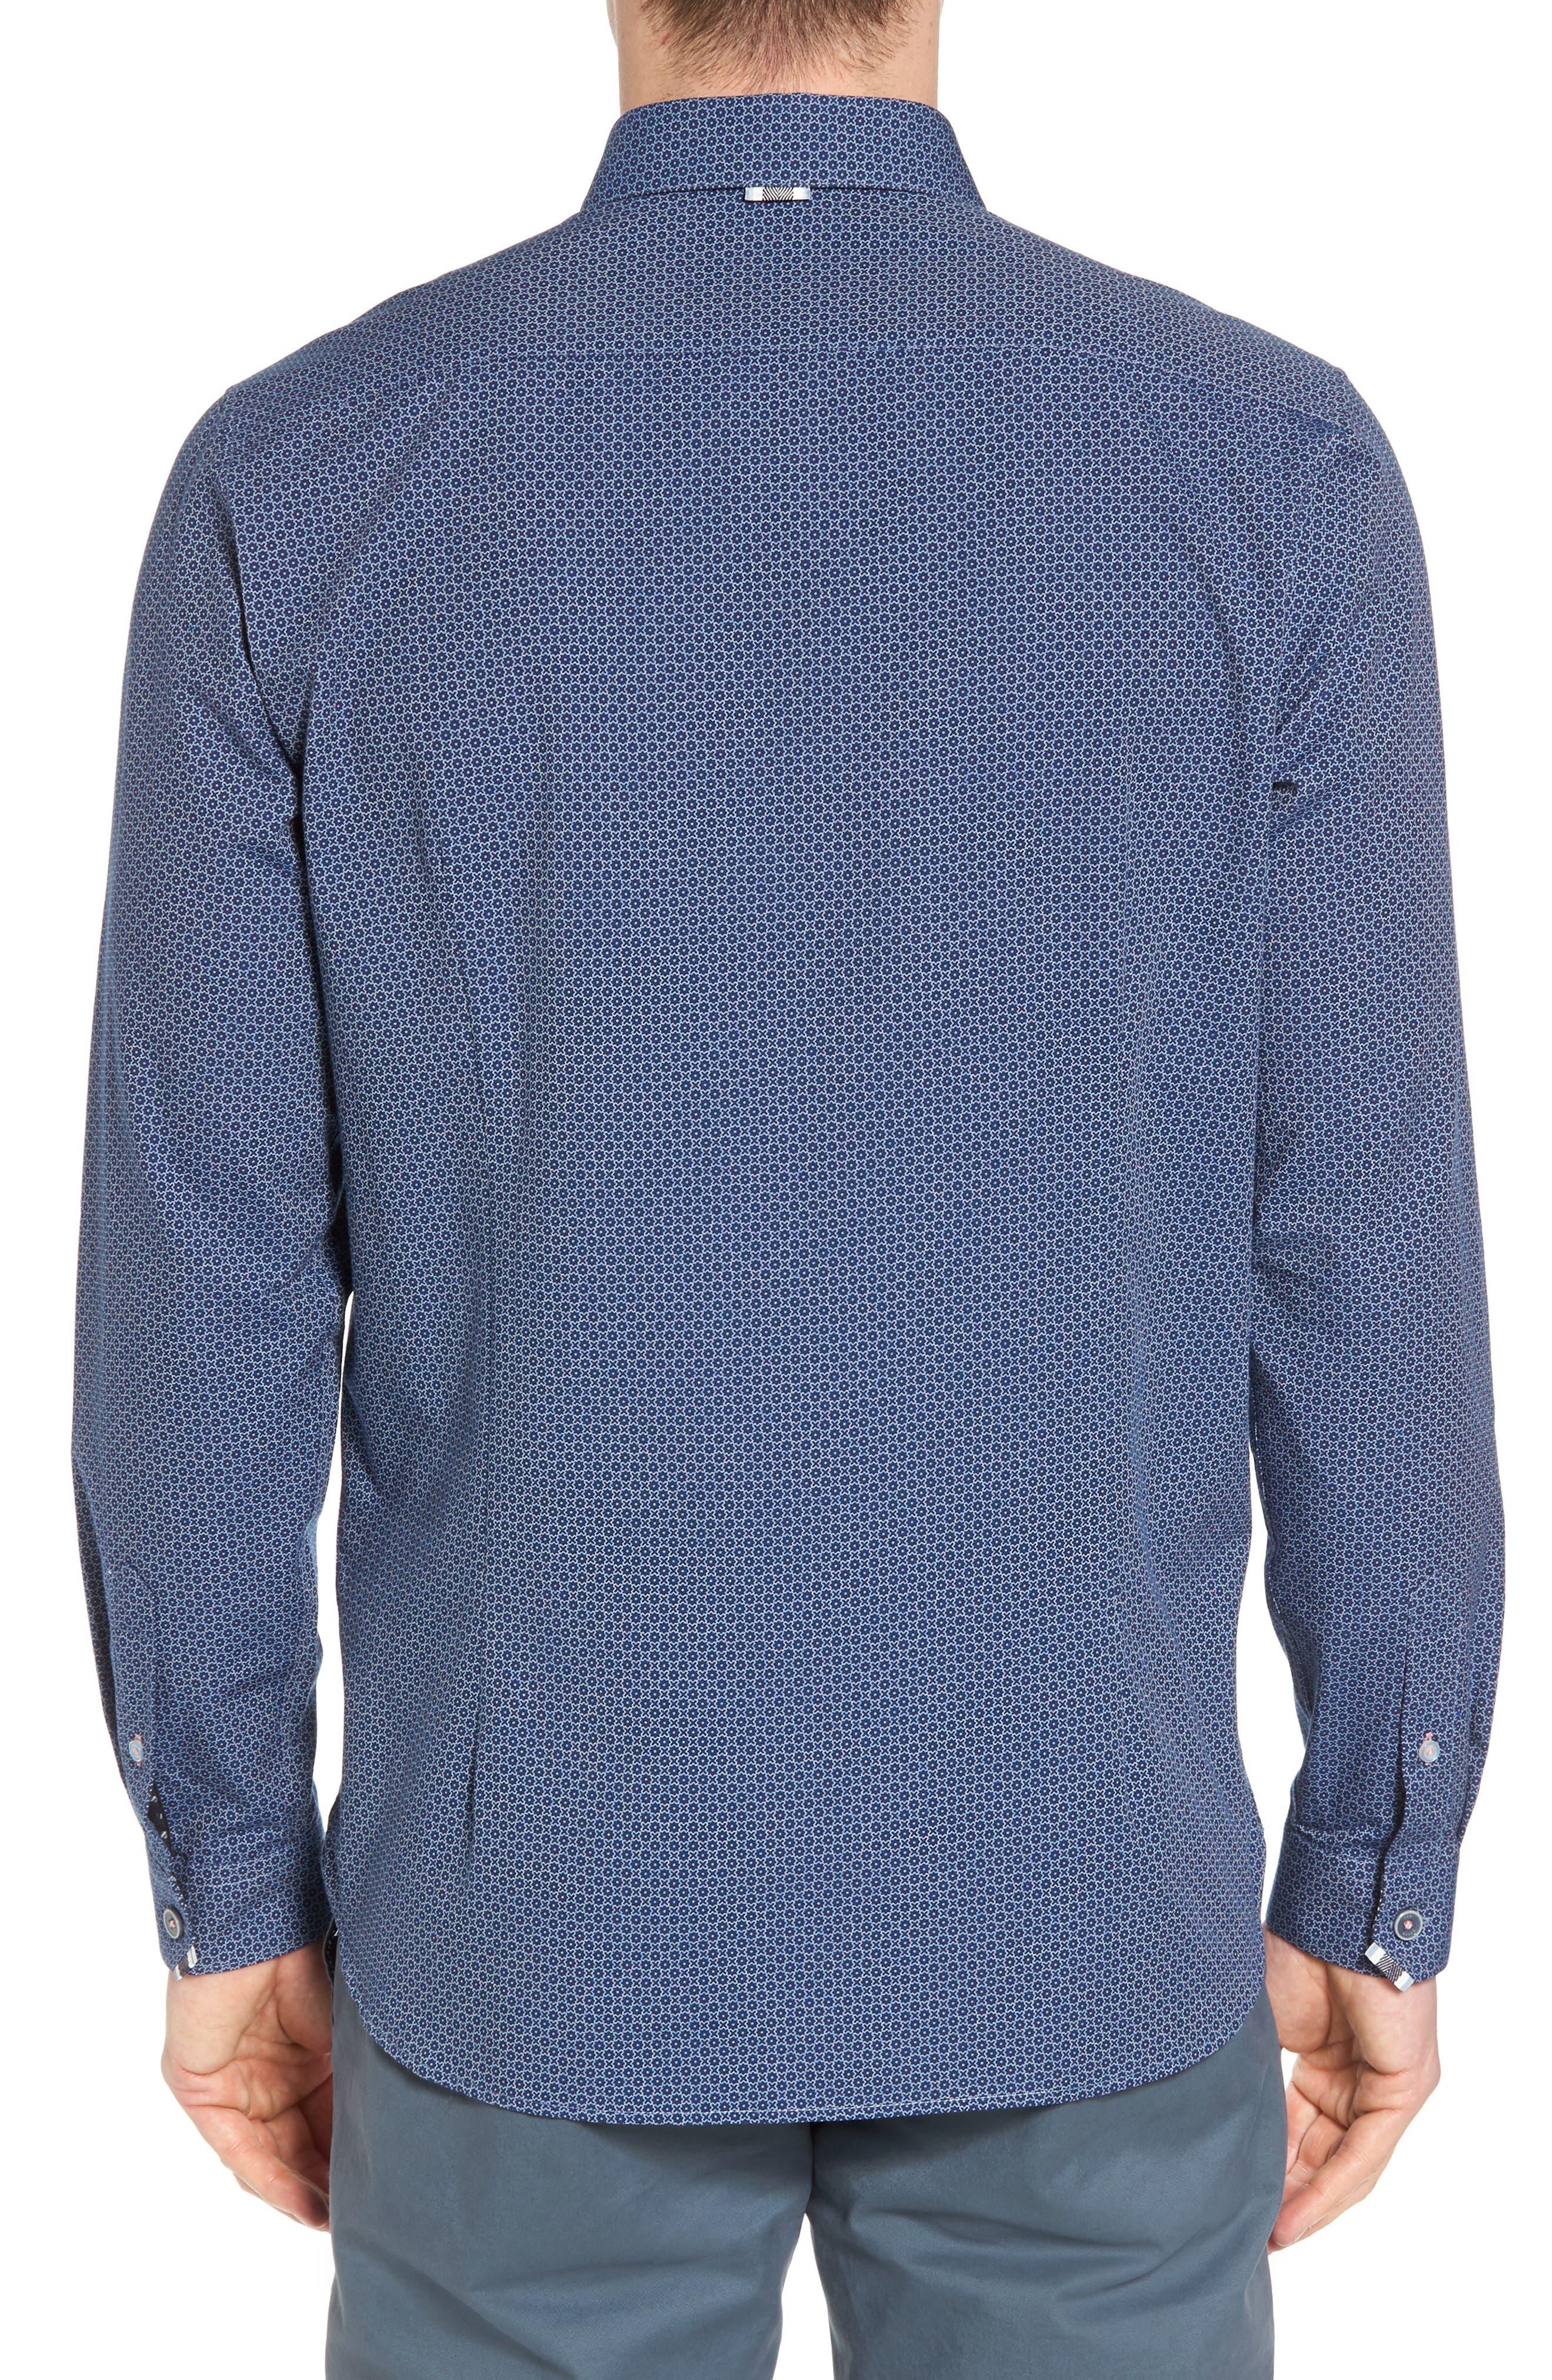 Holic Trim Fit Geometric Sport Shirt,                             Alternate thumbnail 3, color,                             Blue